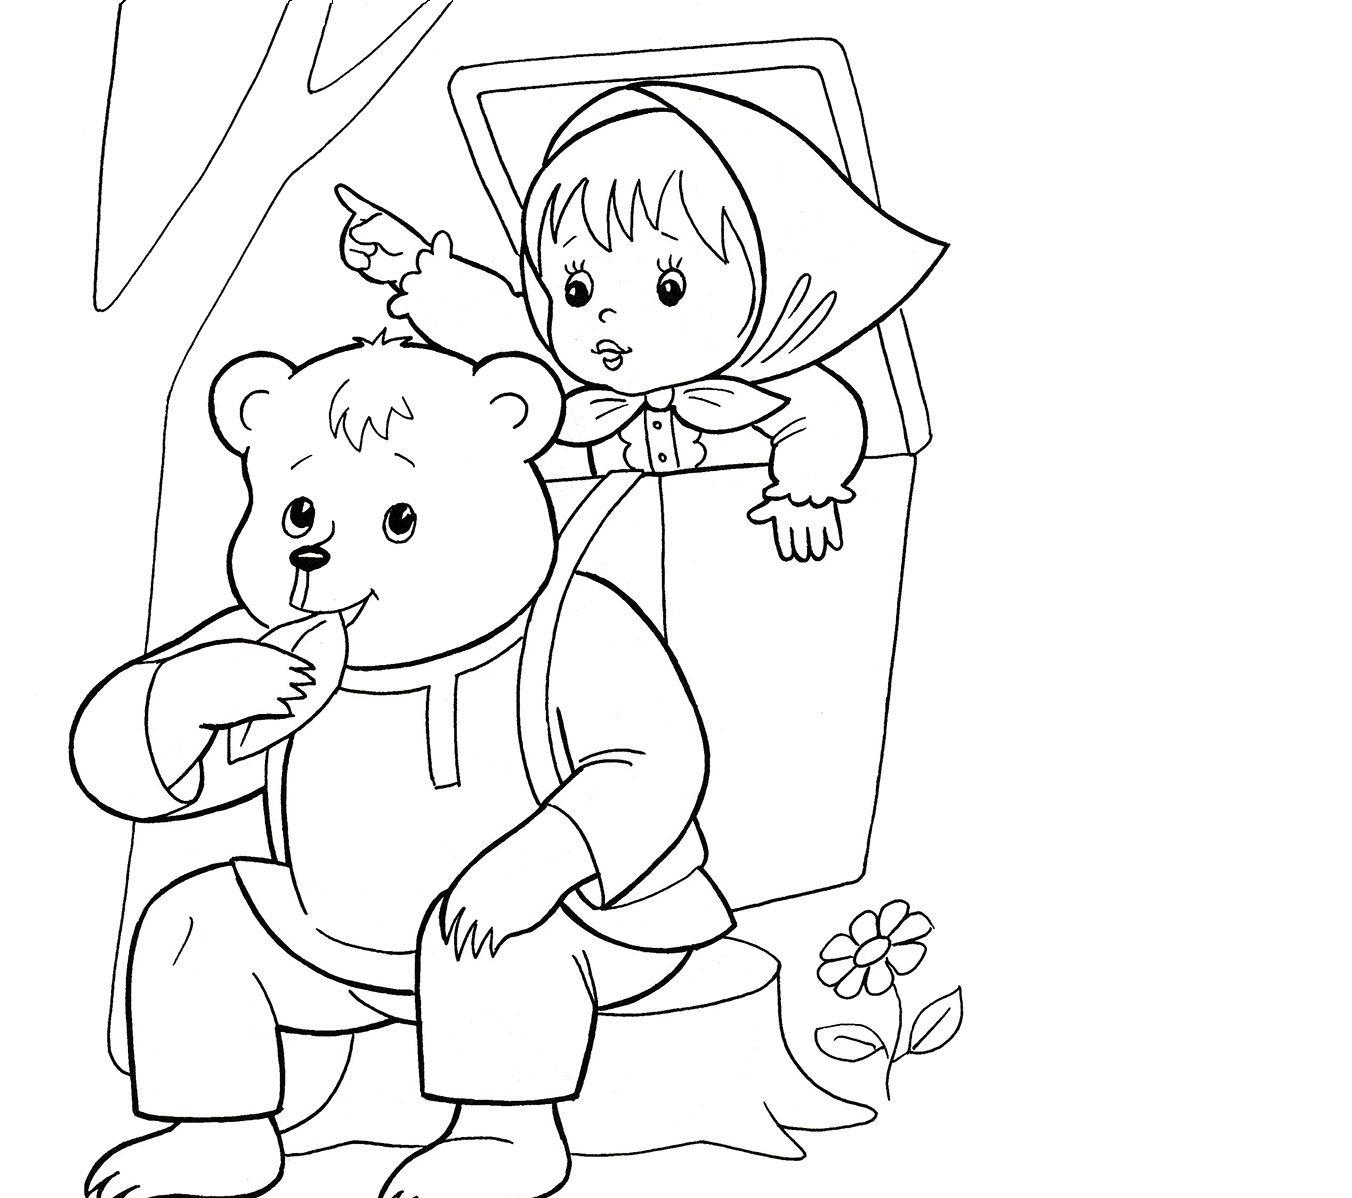 Раскраска сказка Маша и Медведь на vipraskraski.ru